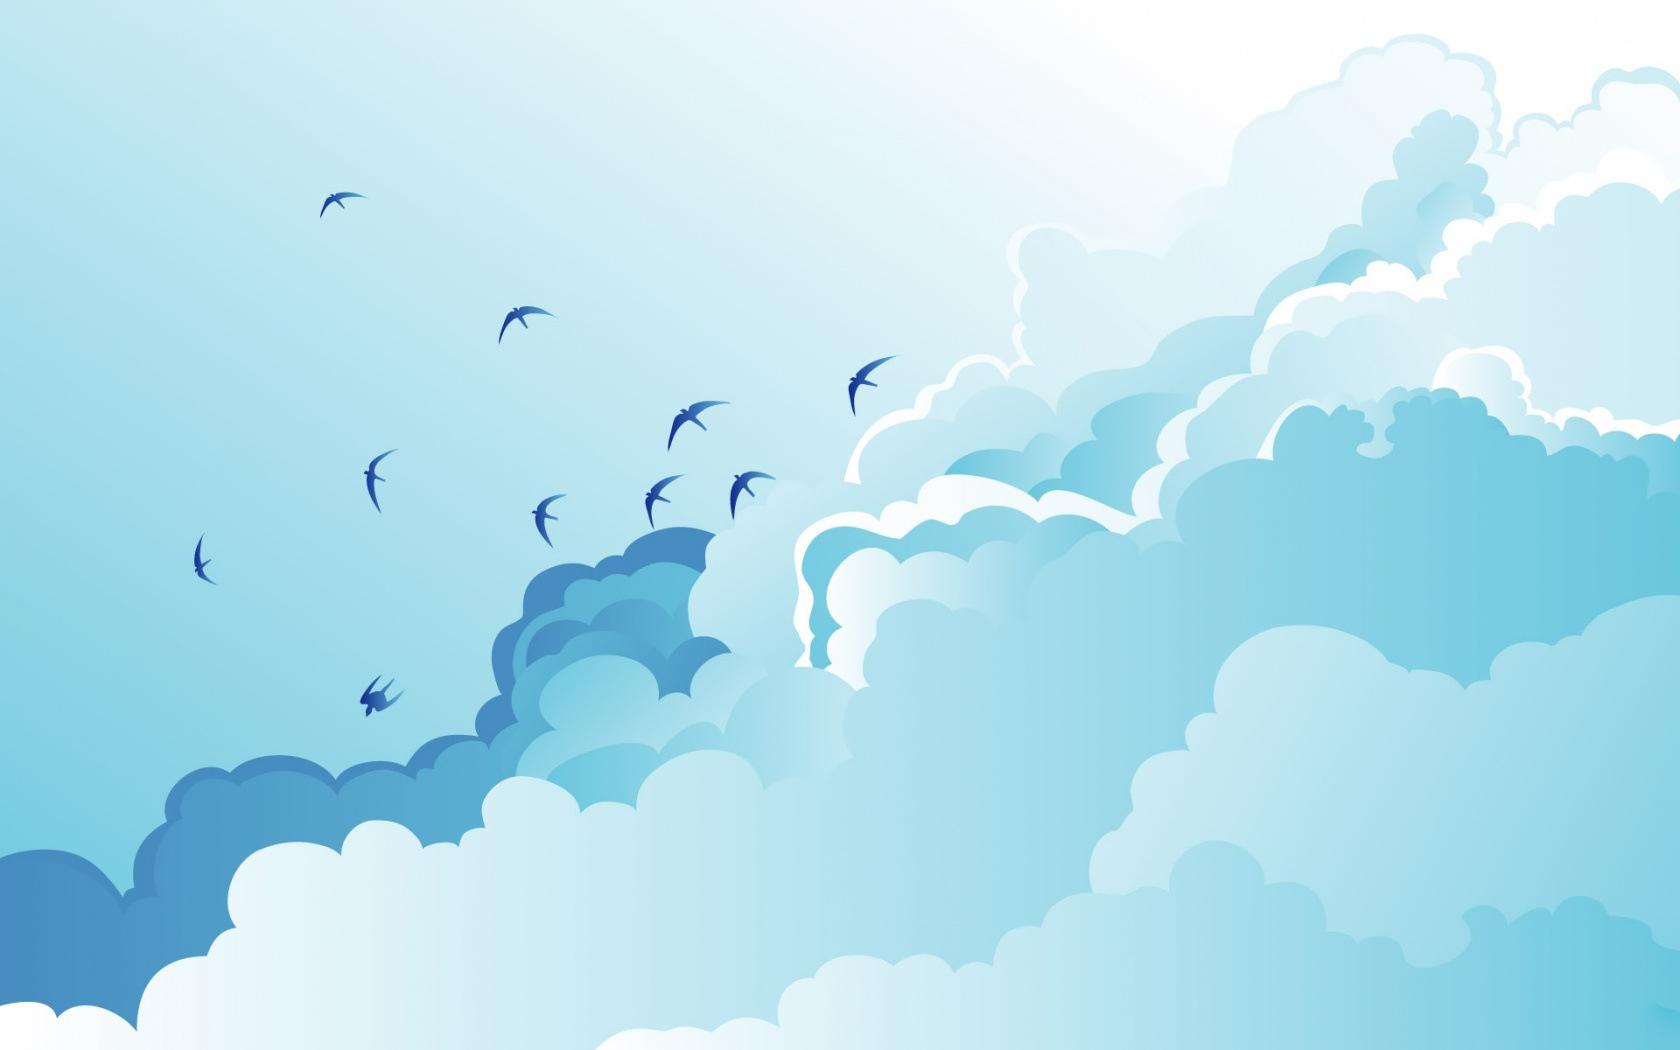 Clouds clipart light blue Collection background Clipart schliferaward Clipart